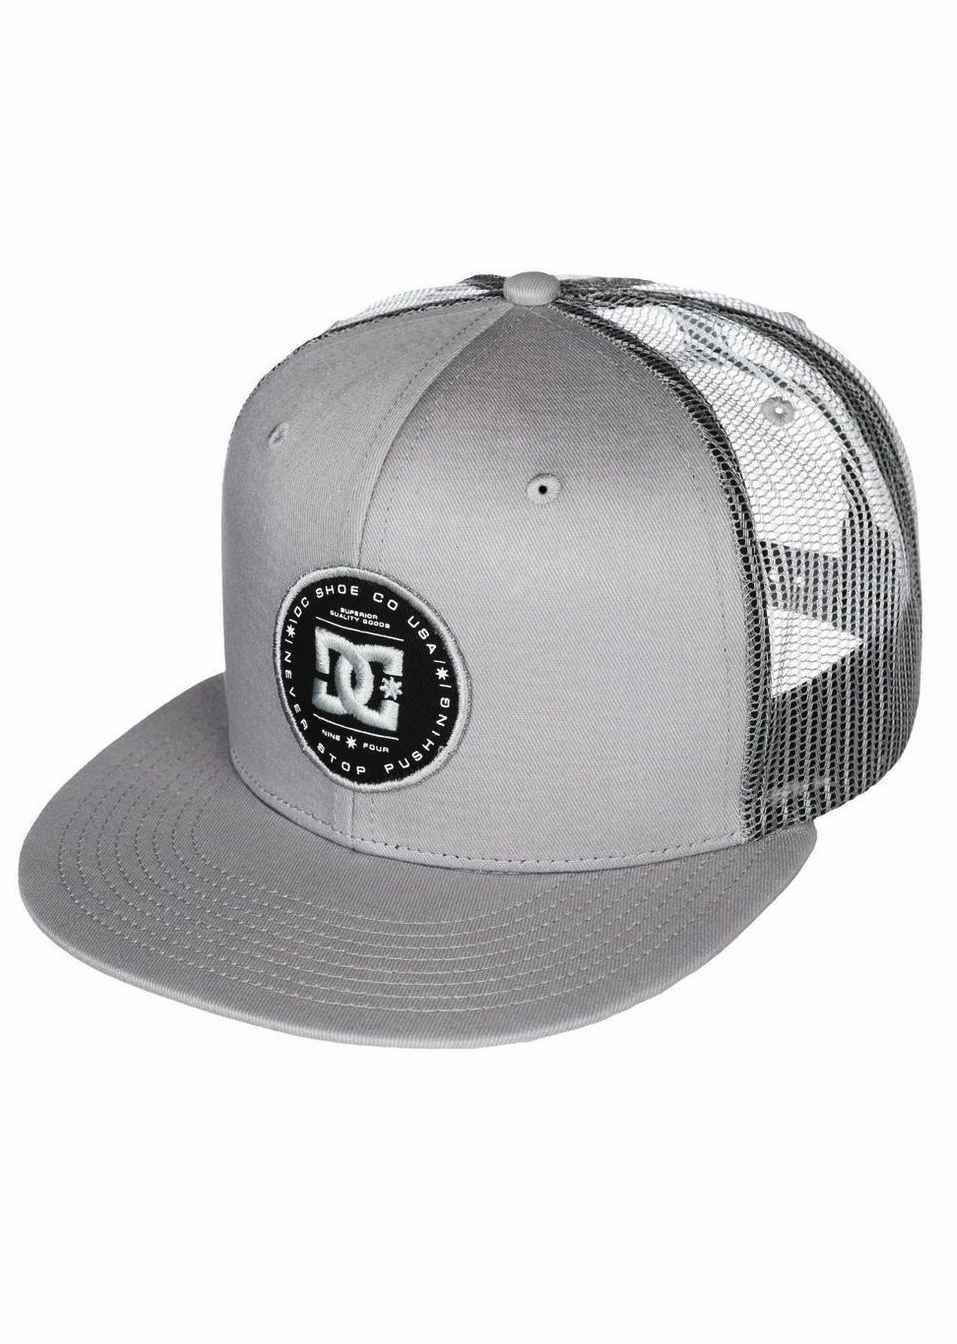 DC SHOES CAP DAXBREAD GREY - LM BOARD STORE